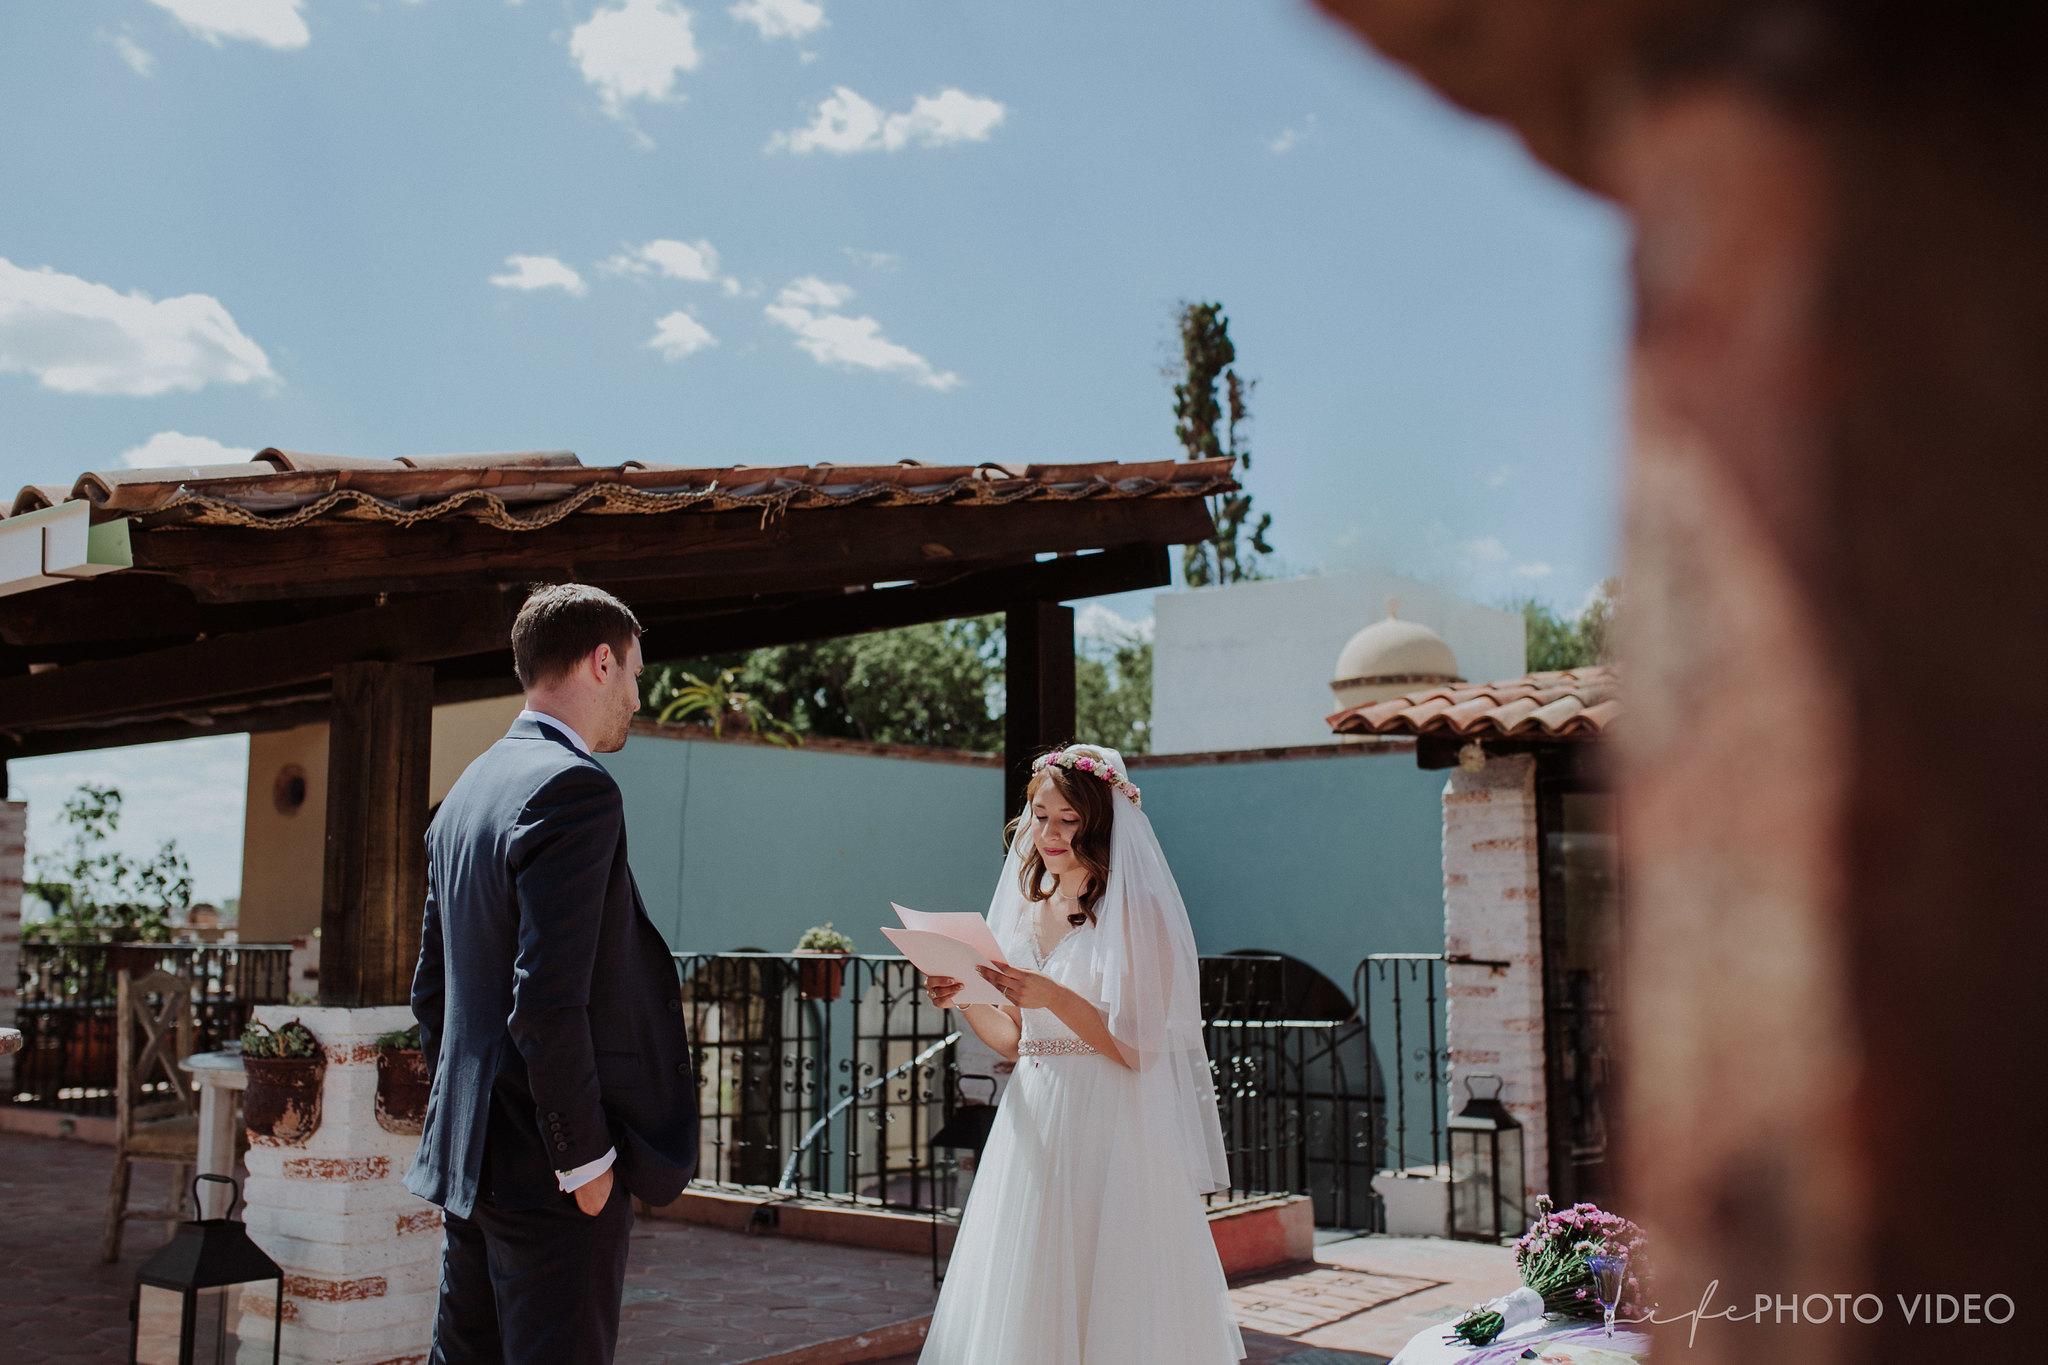 San-Miguel-de-Allende-elopment-Marlene-Patrick_0030